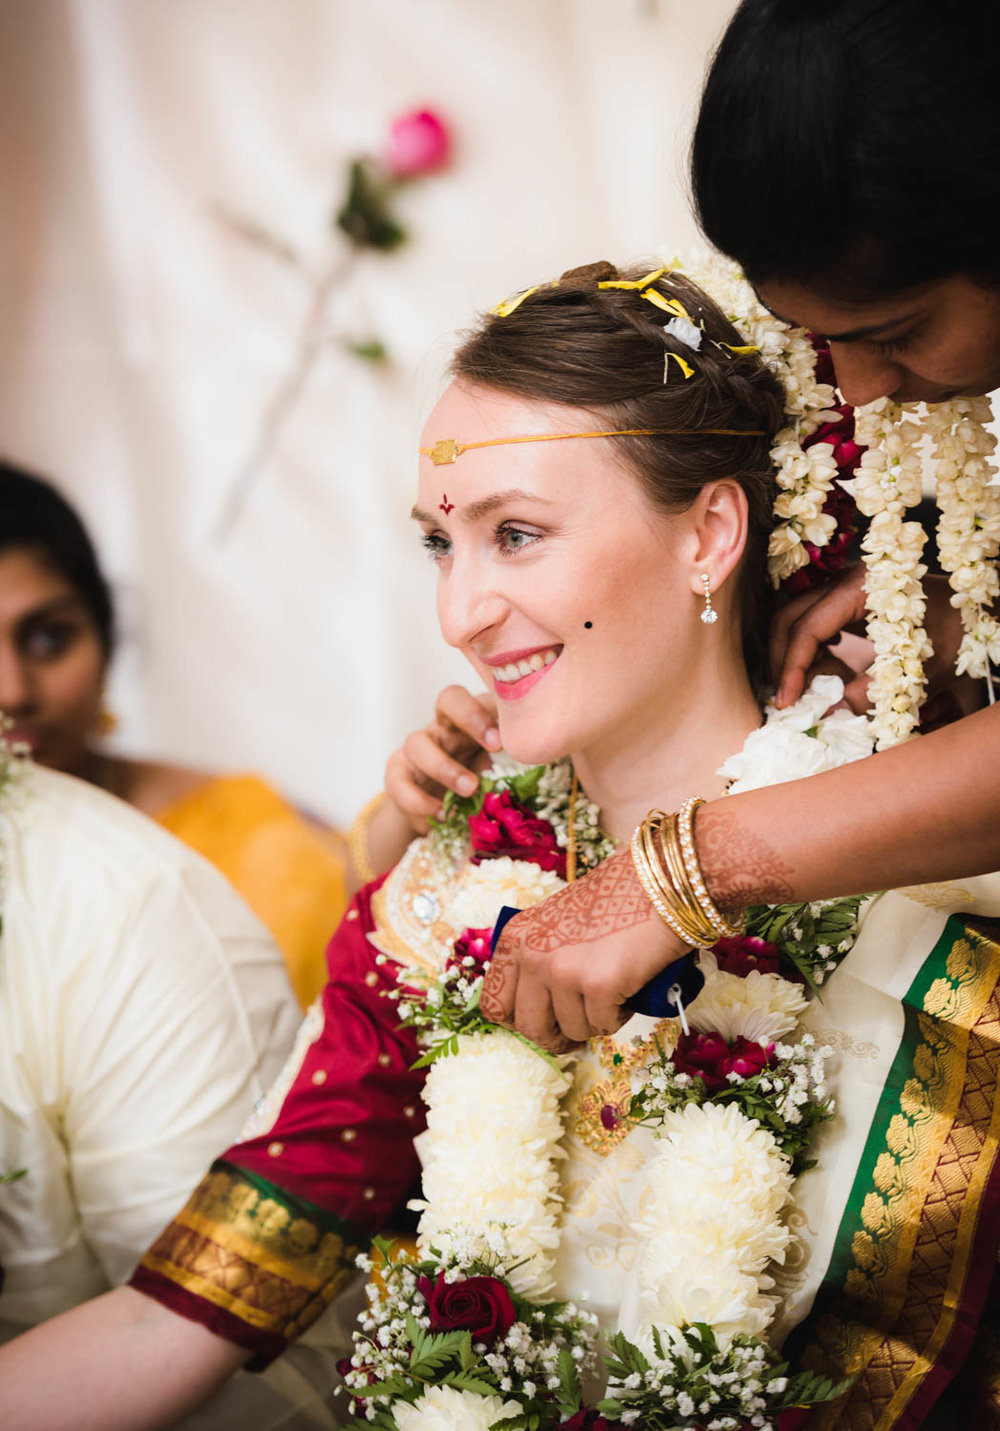 ecaterina-chandu-indian-wedding24.jpg